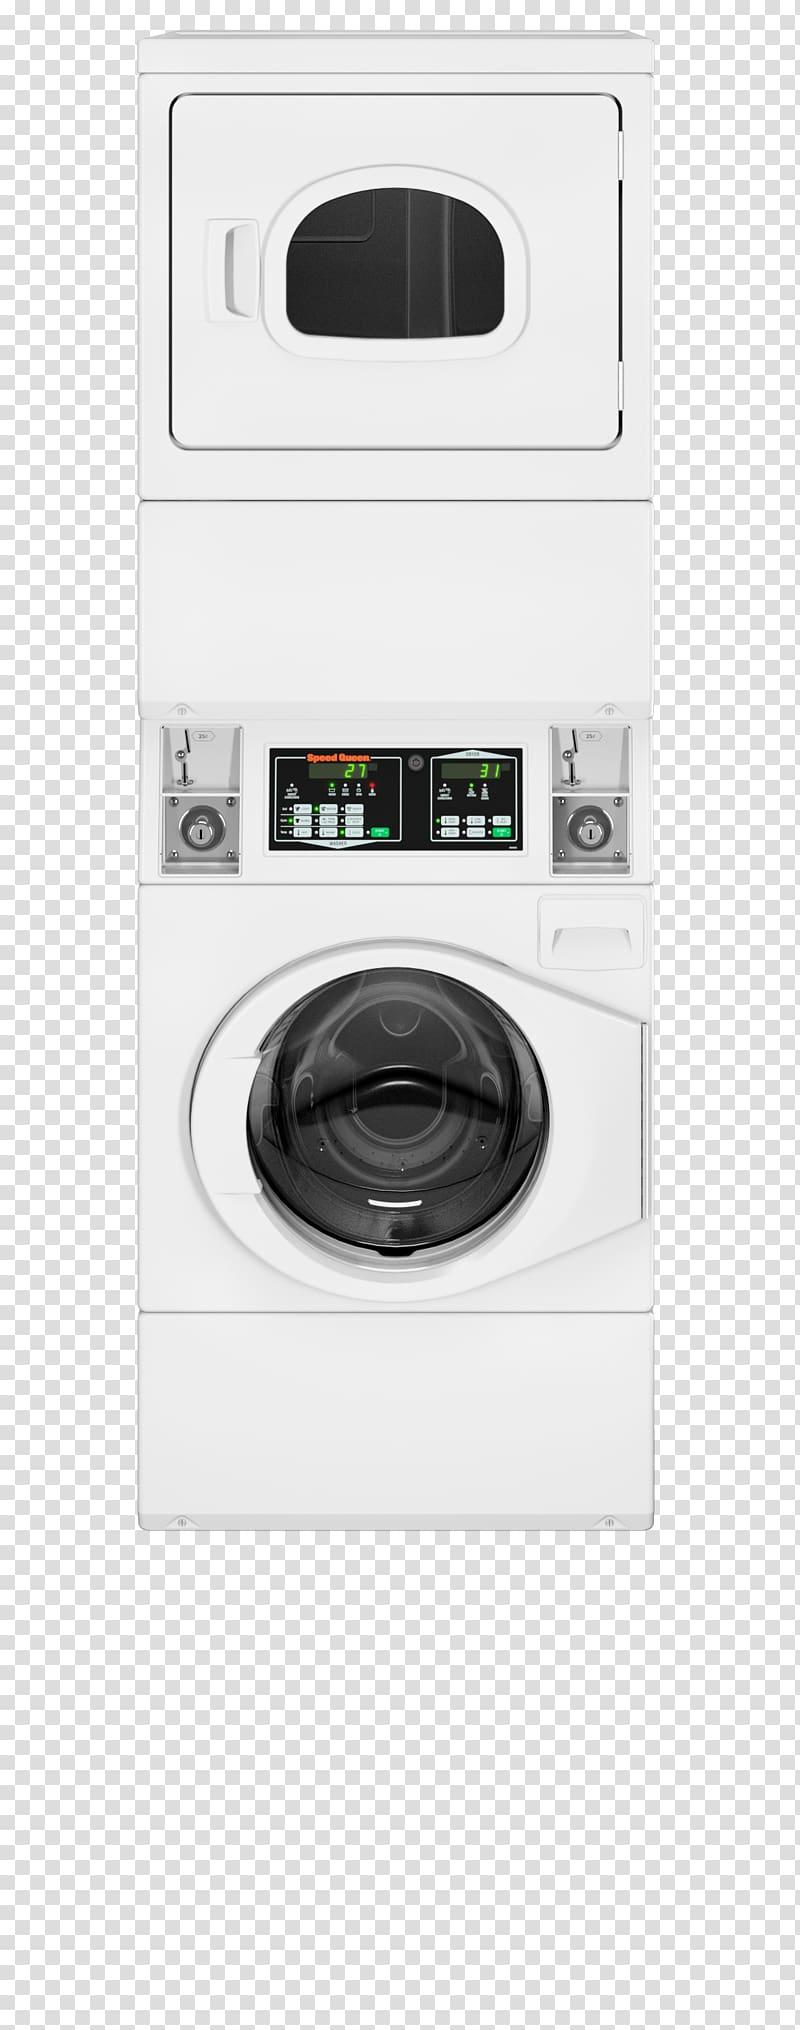 Fagor Innovation Washing Machine